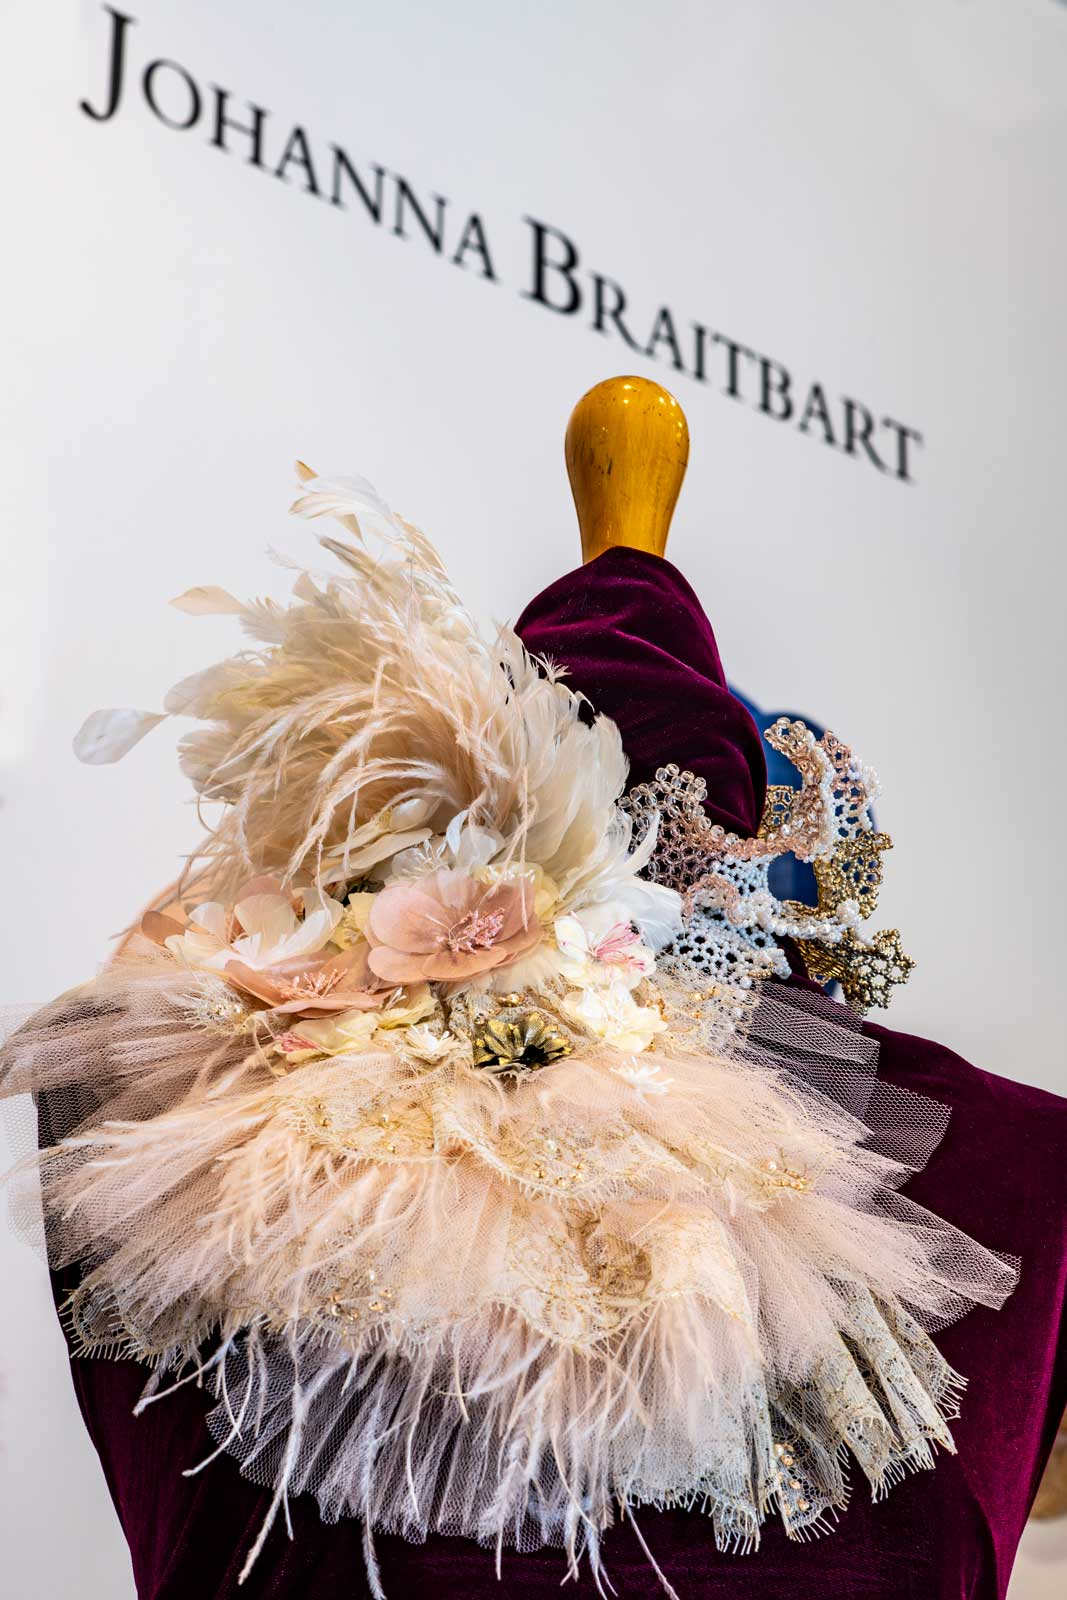 Plastron Haute Couture Plumes Dentelle Fleurs Broderie Johanna Braitbart